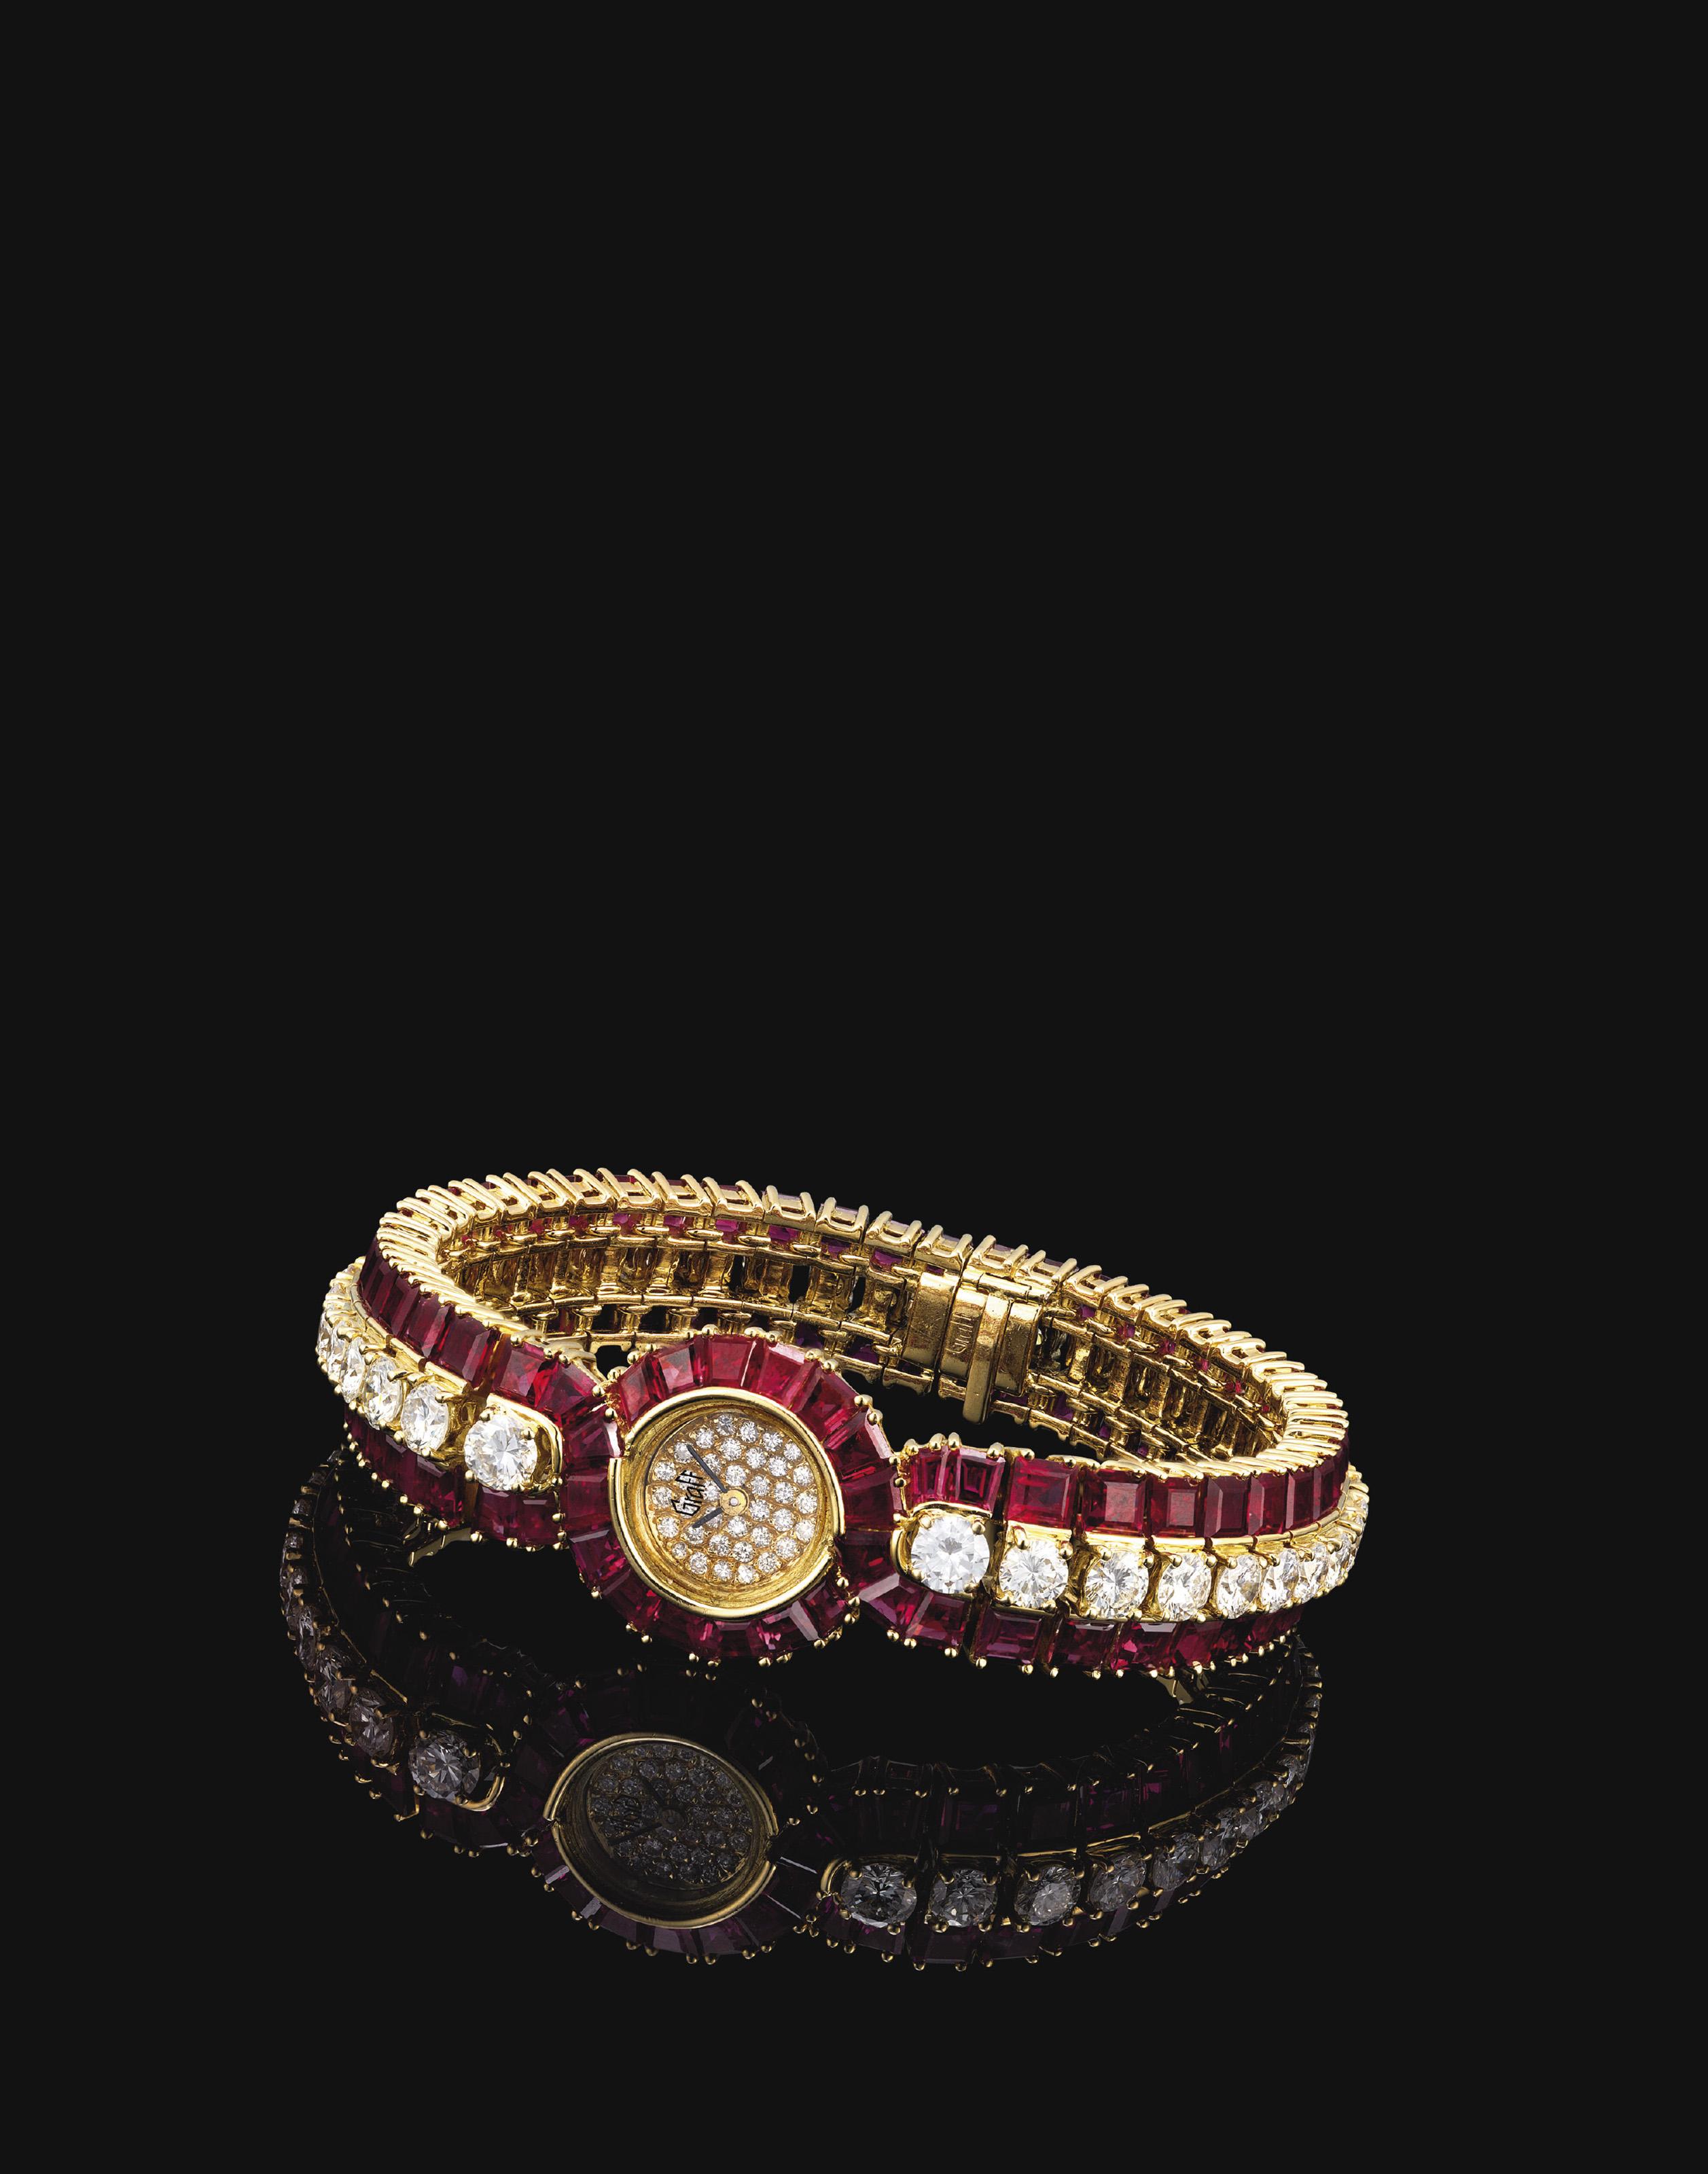 GRAFF. A LADY'S FINE AND ELEGANT 18K GOLD, RUBY AND DIAMOND-SET BRACELET WATCH